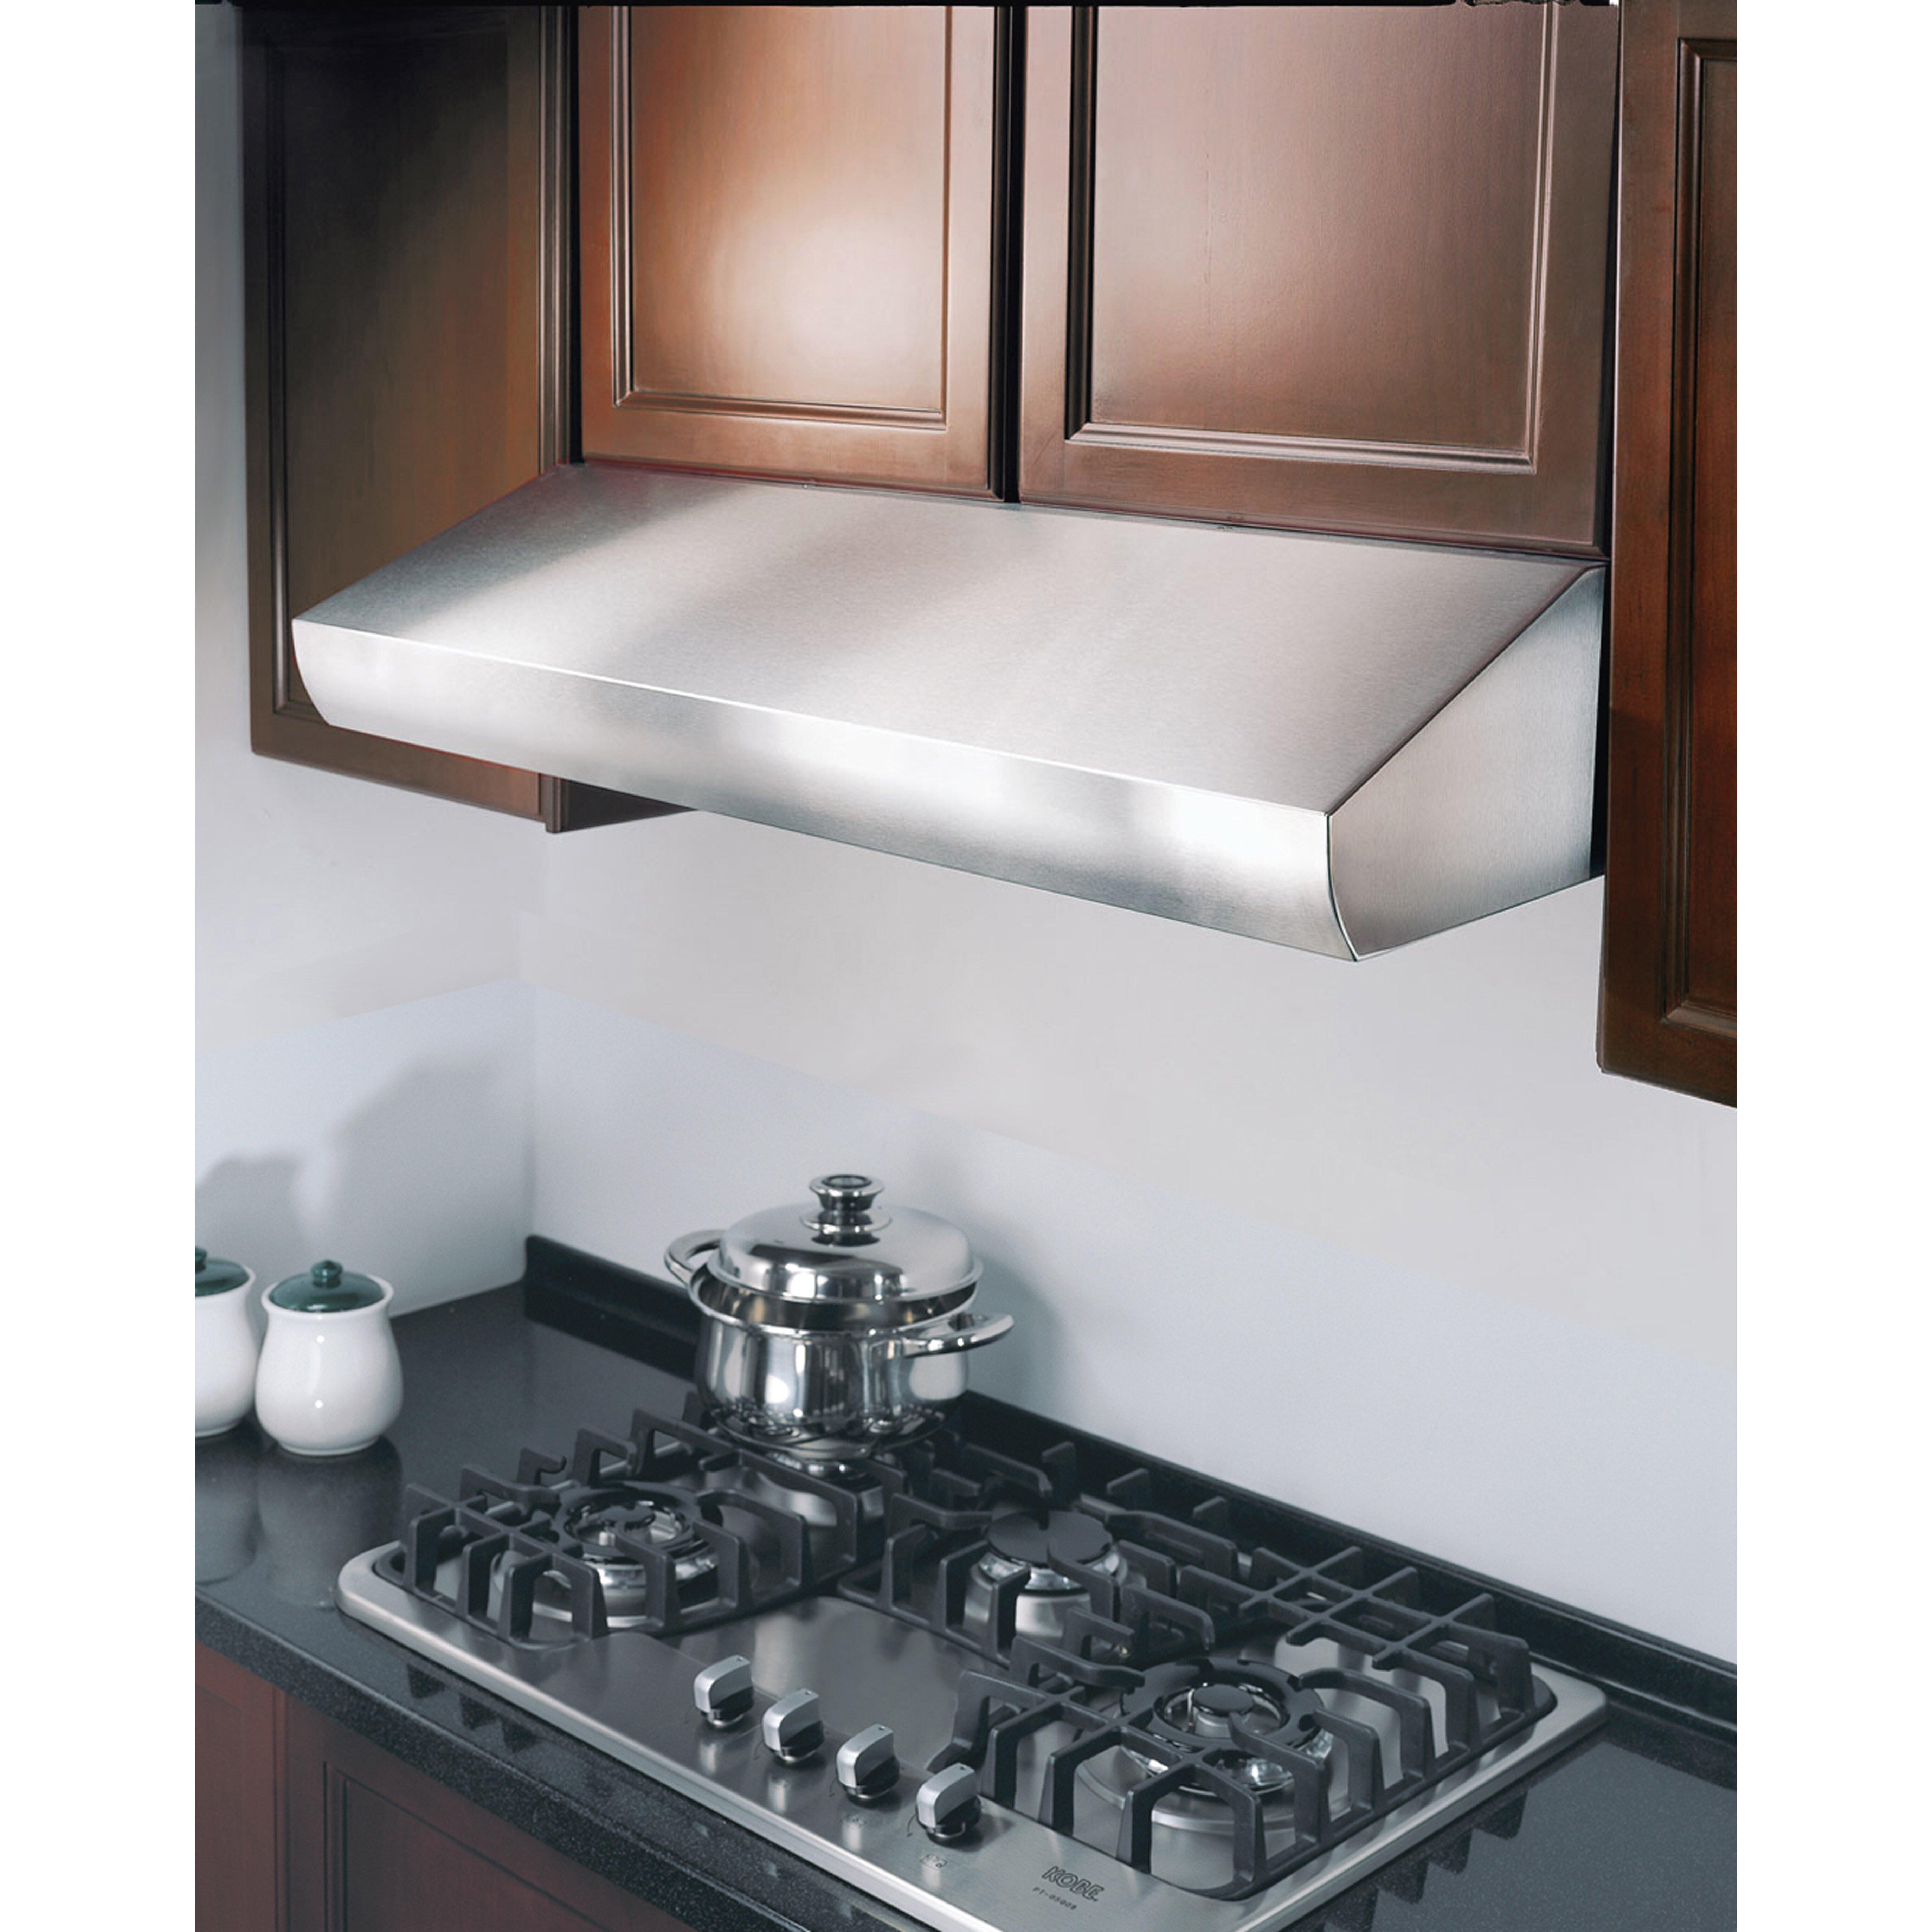 ancona chef under cabinet ii kitchen range hood installation 30 unique ancona advanta pro iii under cabinet range hood reviews      rh   youvisit info